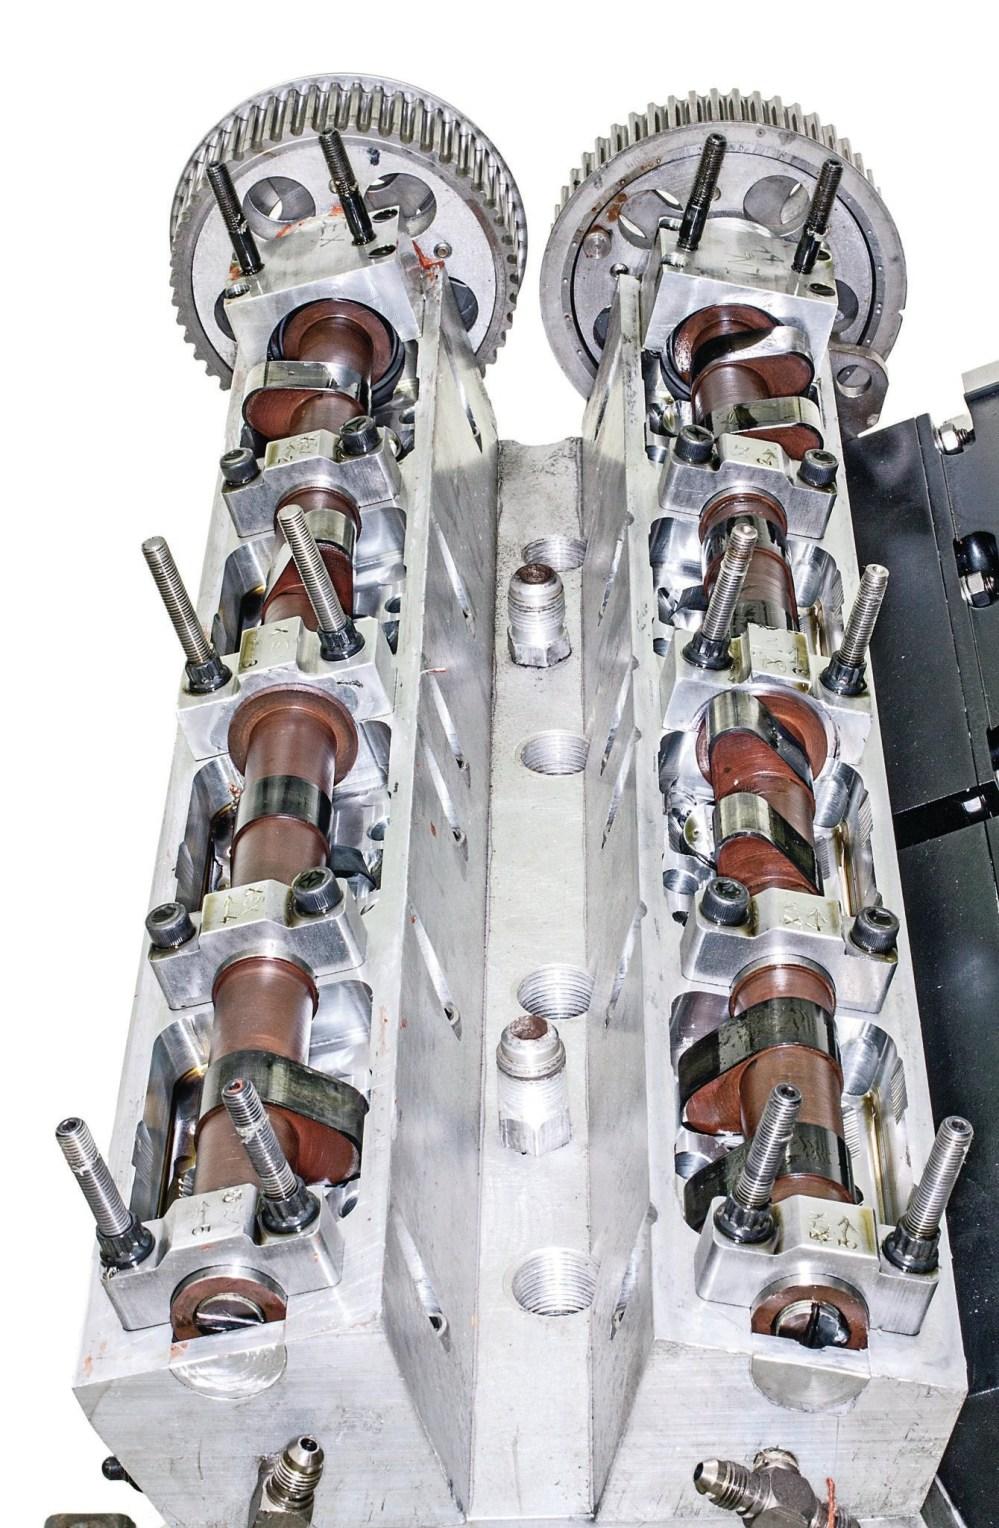 medium resolution of dual overhead cam engine diagram my wiring diagram 1jz alternator wiring diagram 1jz gte engine diagram